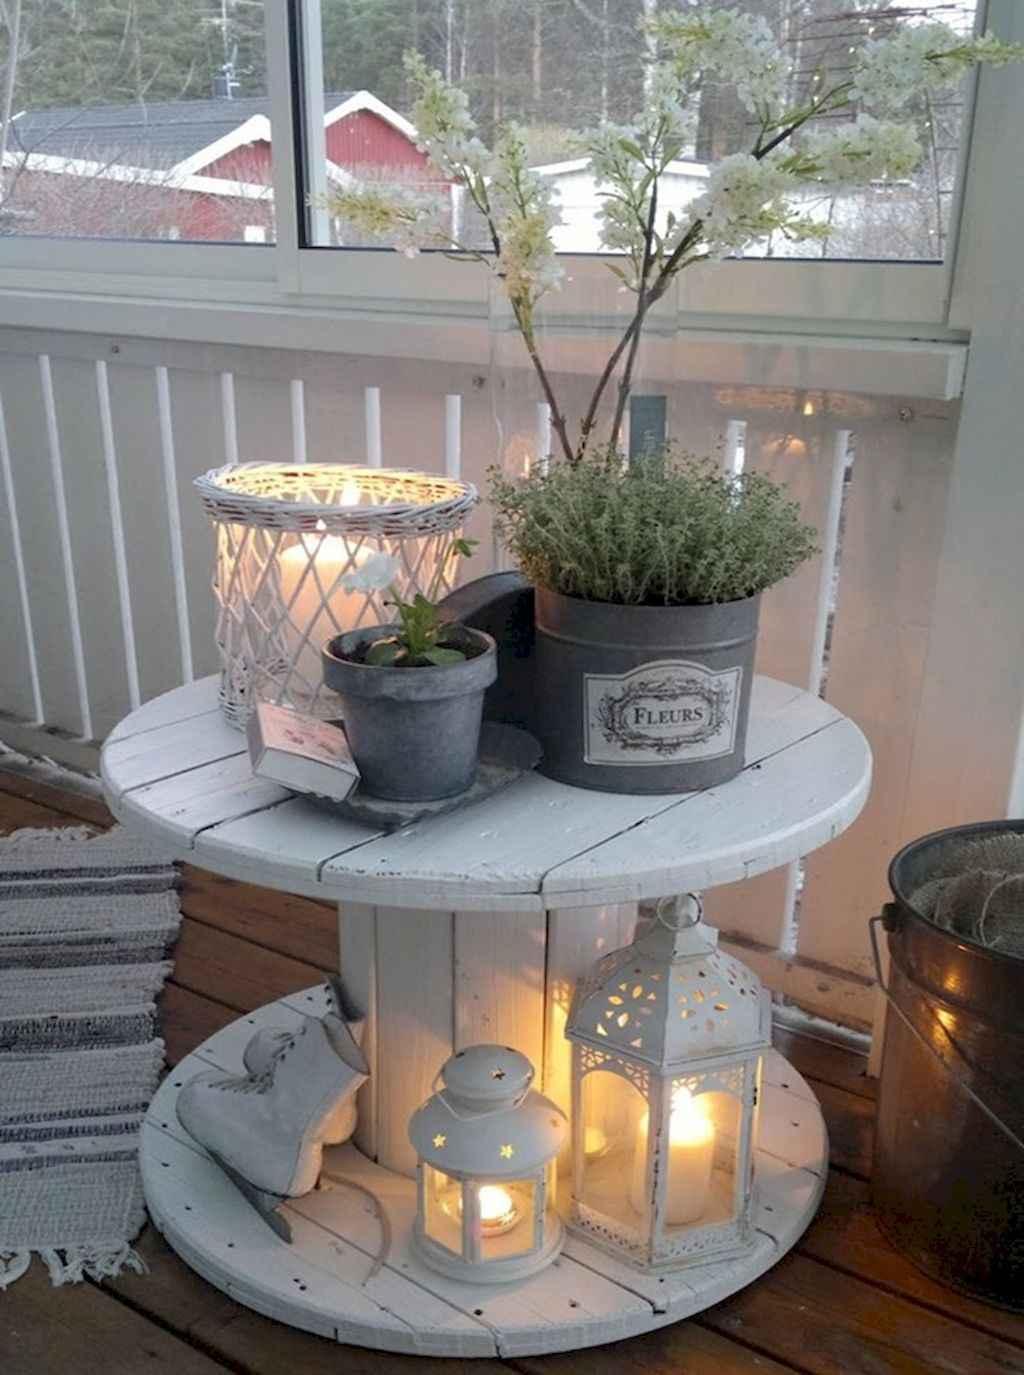 Cleverly diy porch patio decorating ideas (42) & 55 Creative DIY Patio Furniture u0026 Decoration Ideas - HomeSpecially